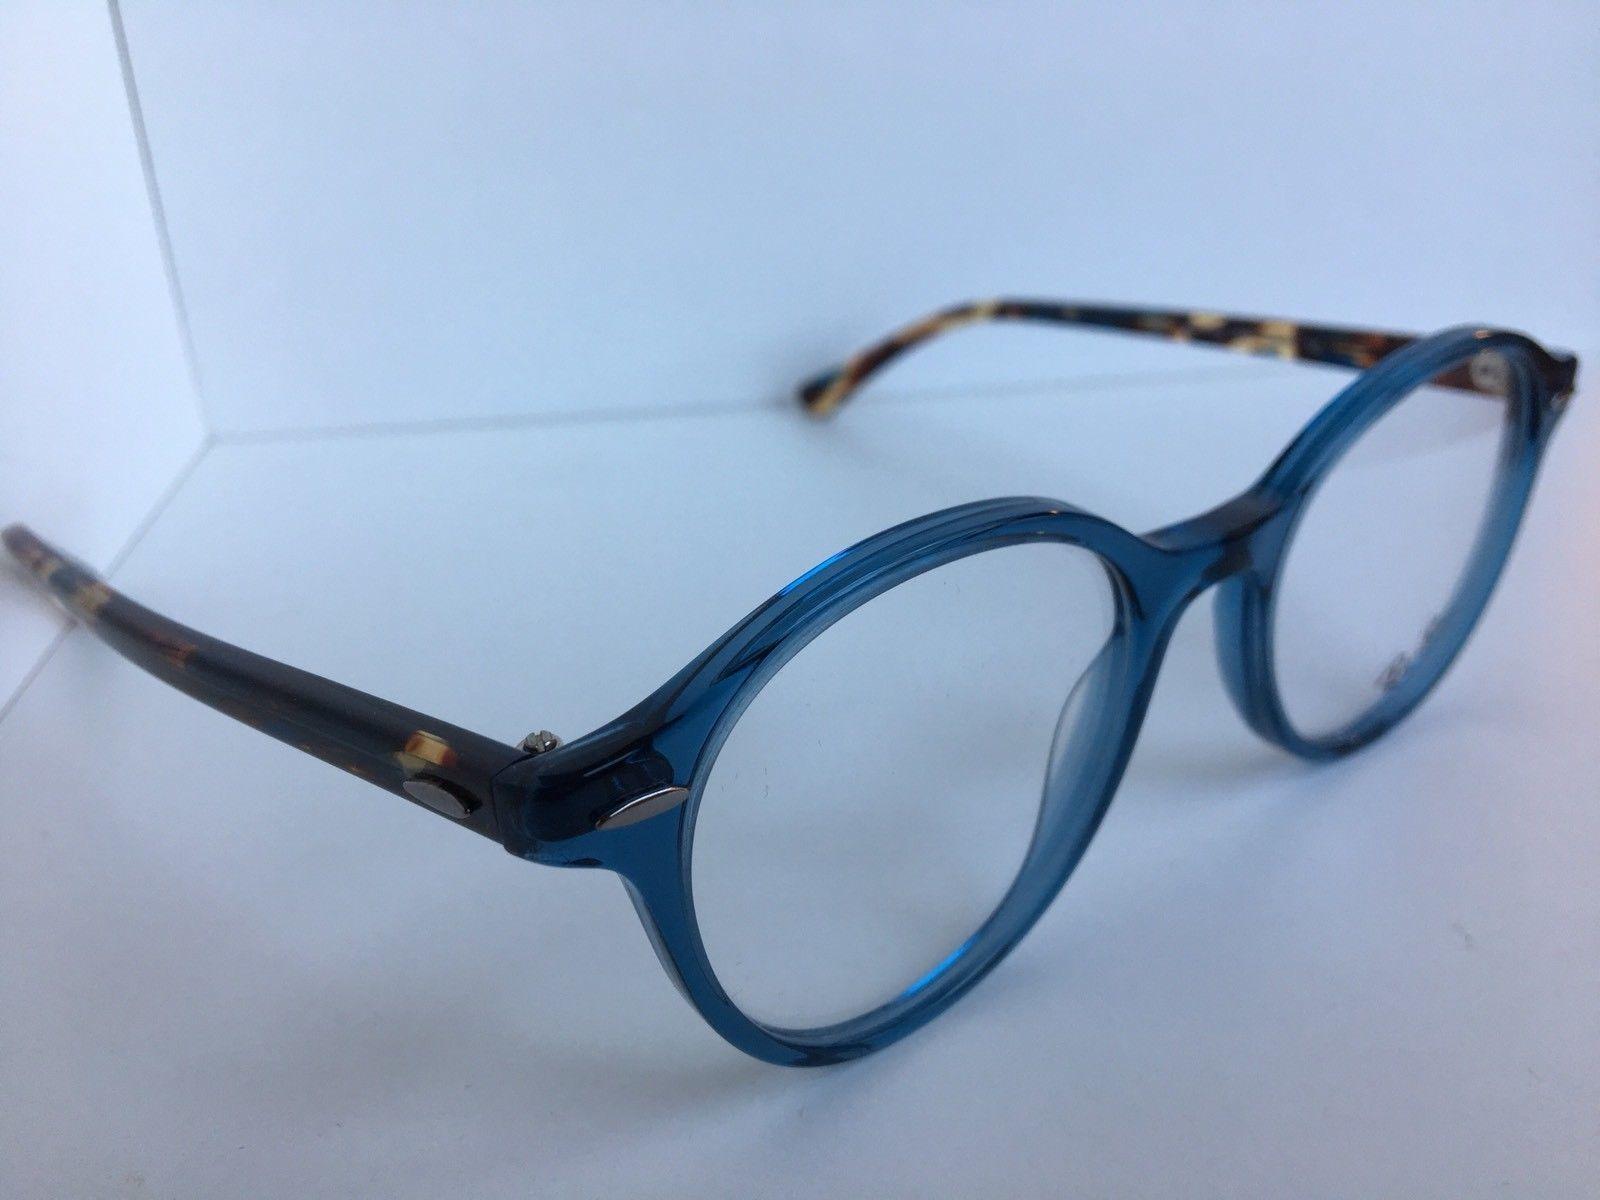 aefc390e43d ... New Ray-Ban RB 7118 RB7118 8022 48mm Rx Round Blue Havana Eyeglasses  Frames